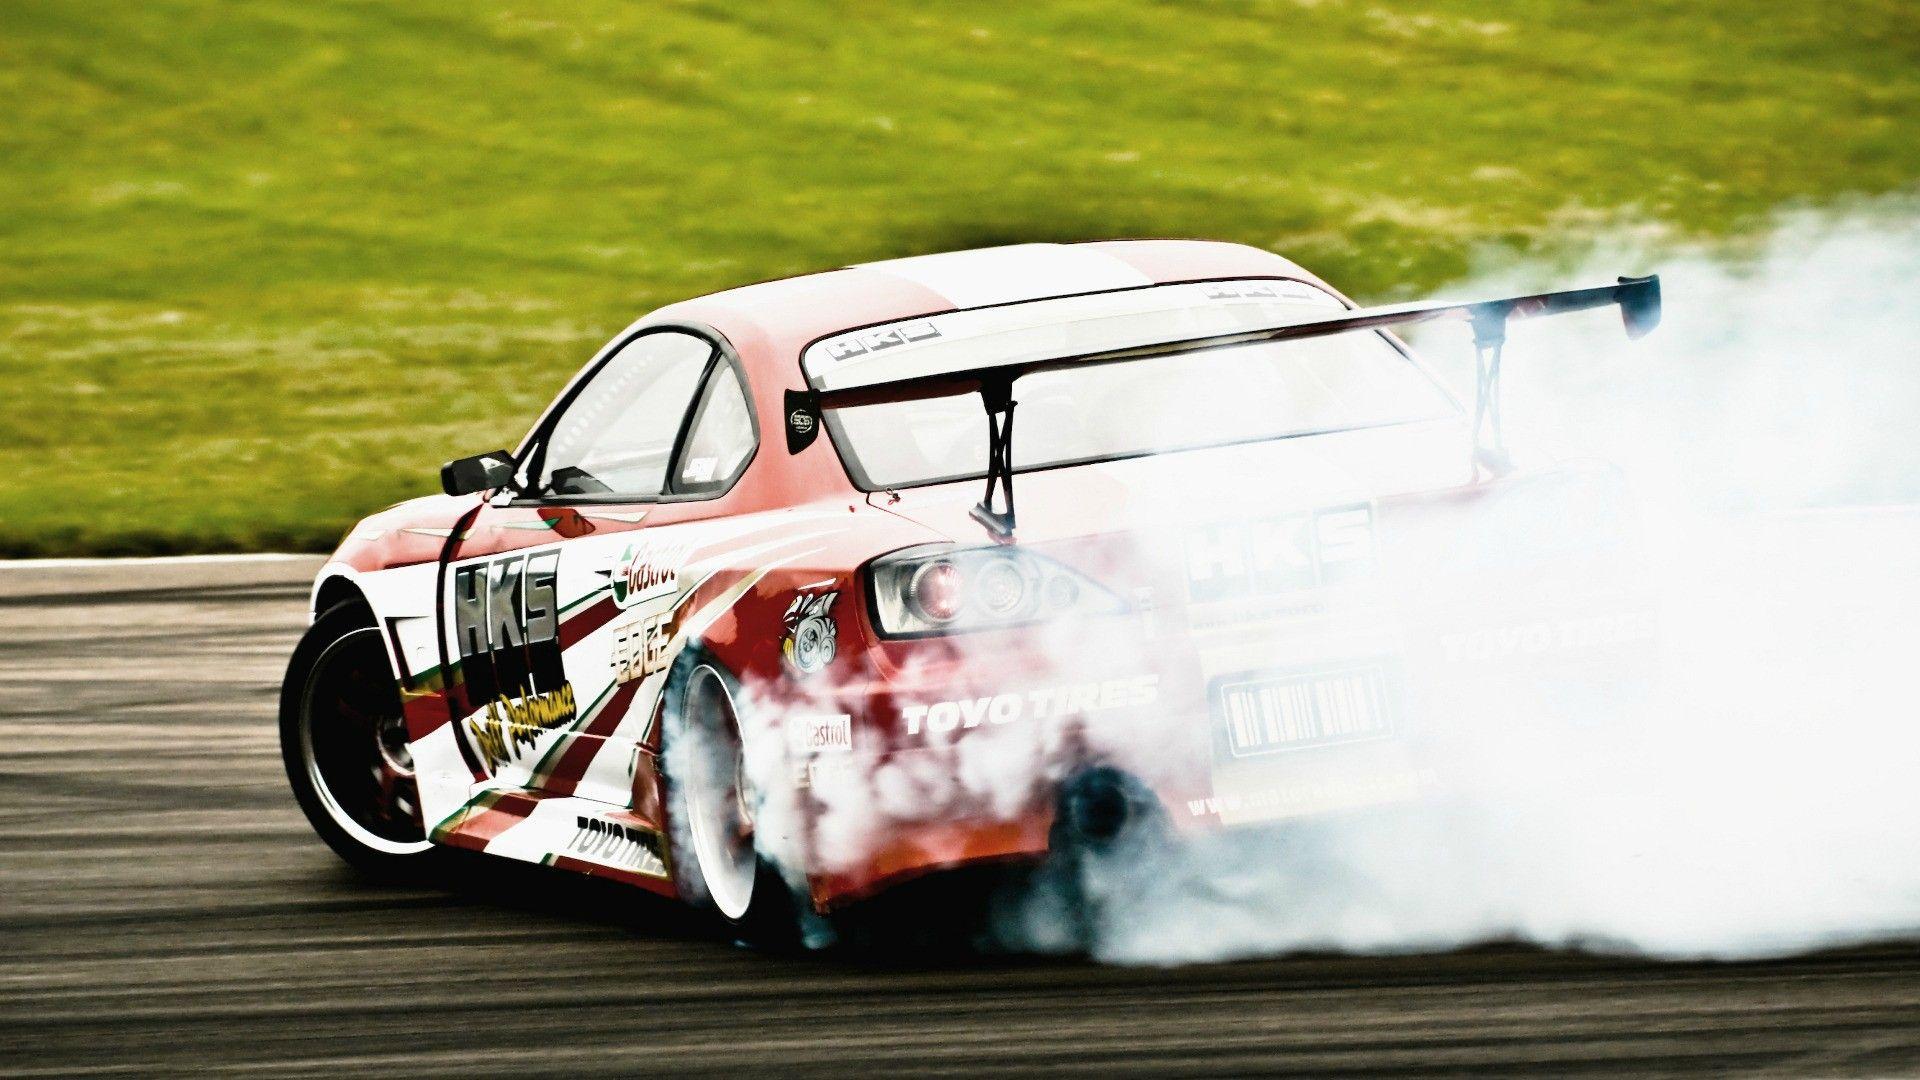 Mobile And Desktop Wallpaper Hd Drifting Cars Drift Cars Car